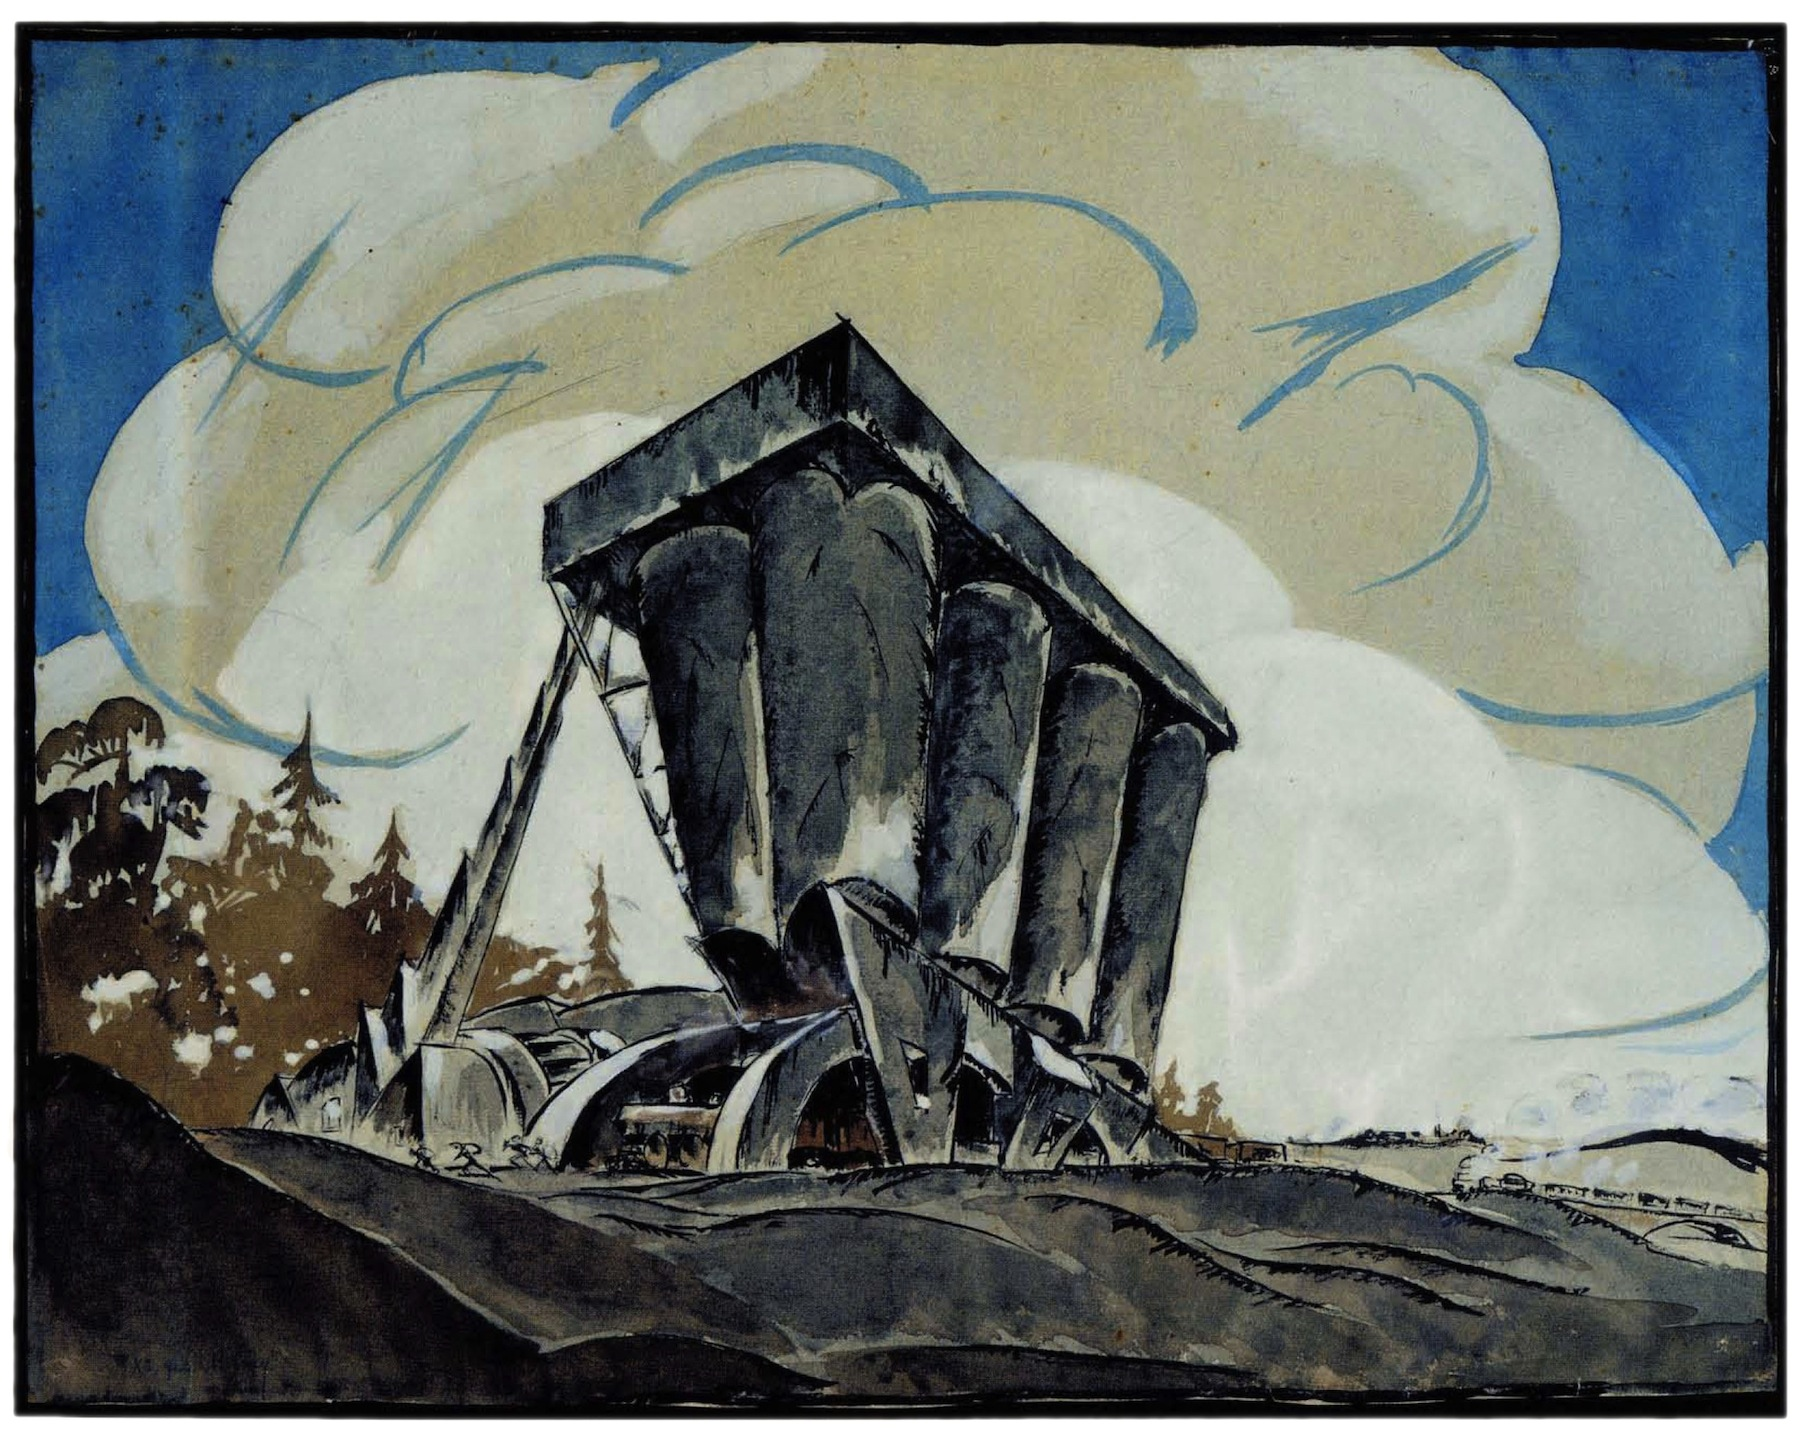 V Vladimirov, Nikolai Ladovskii's workshop, grain elevator, revelation and expression of form, 1922